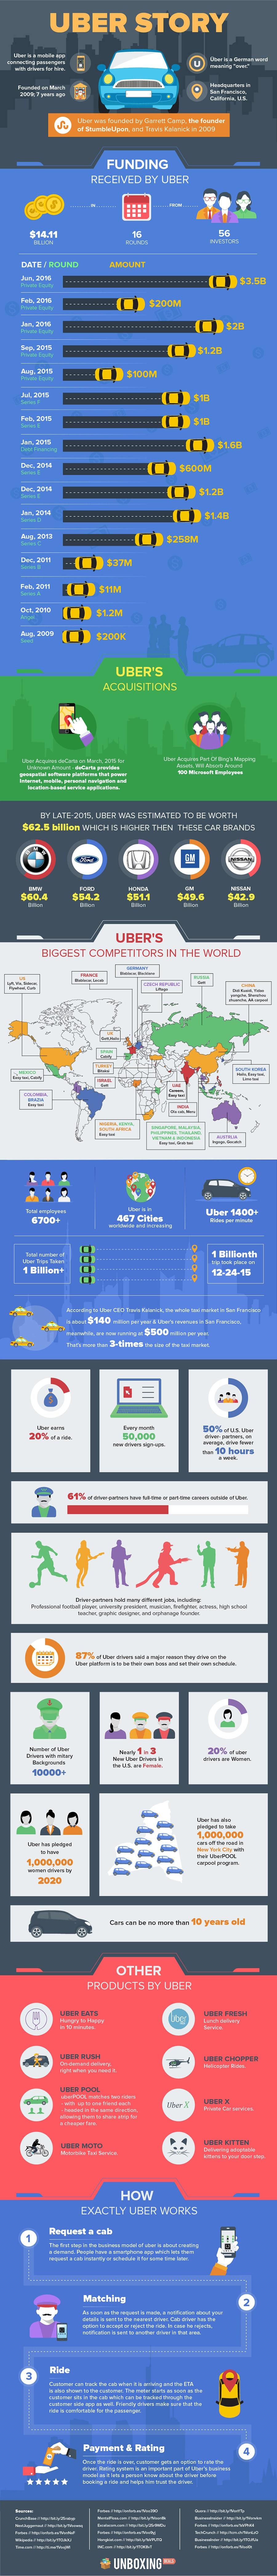 Billion Dollar Uber [Infographic]